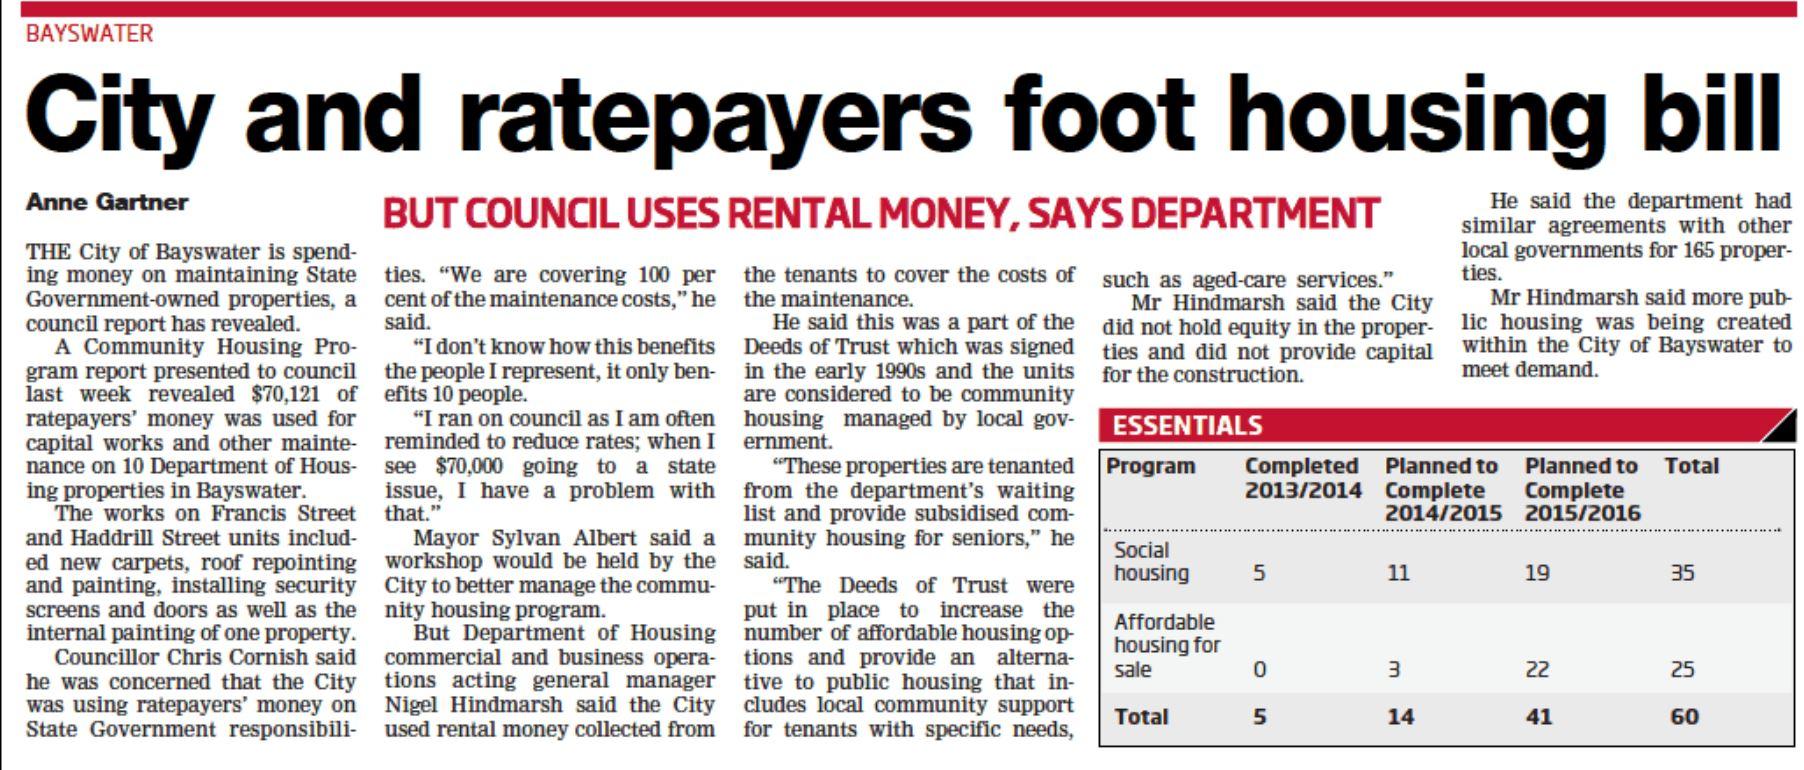 141104 Public Housing Cost